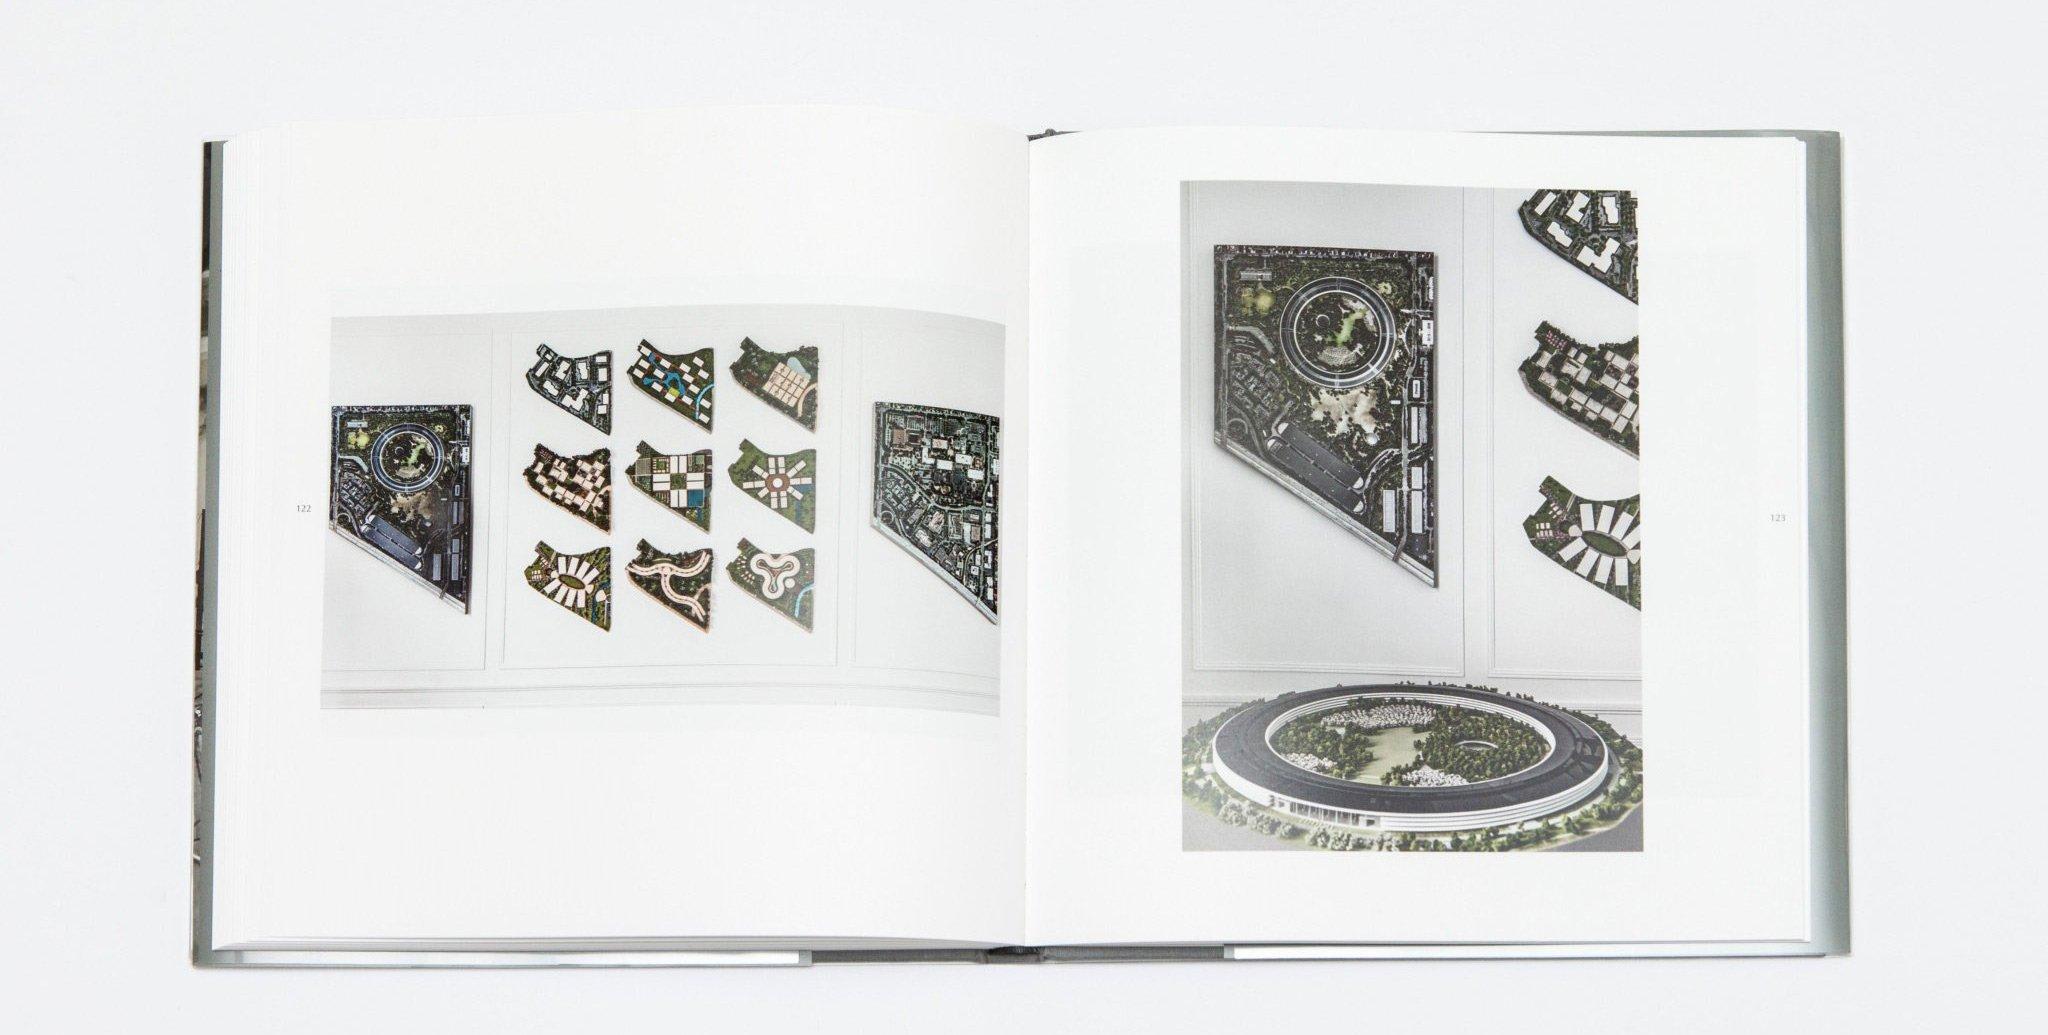 szkice apple park z książki Spaces